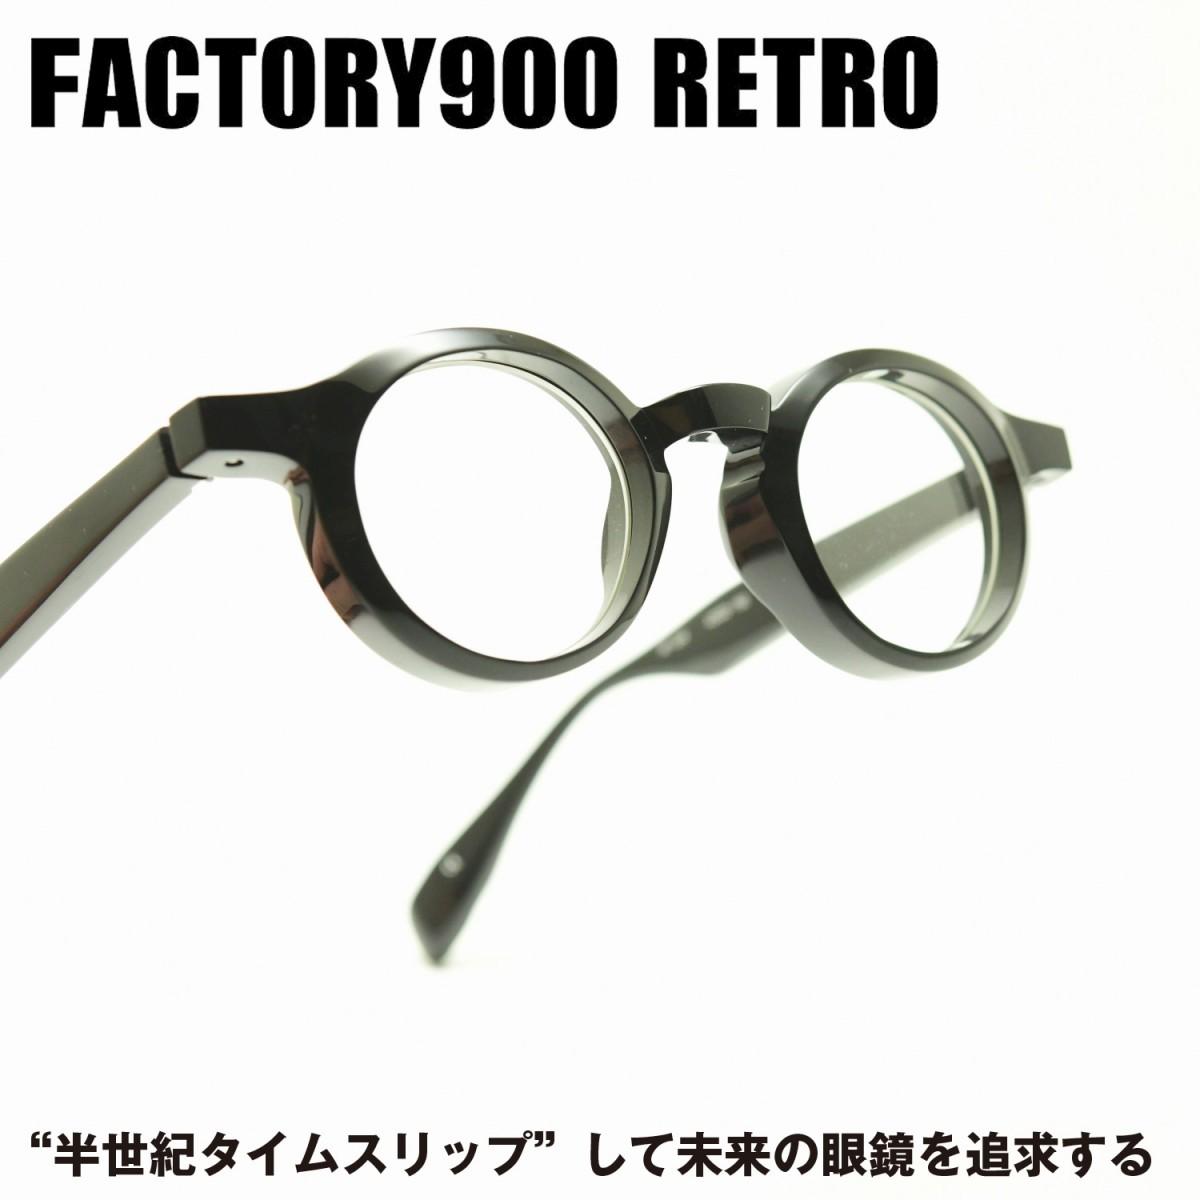 FACTORY900 RETRO ファクトリー900レトロRF-004 col-001